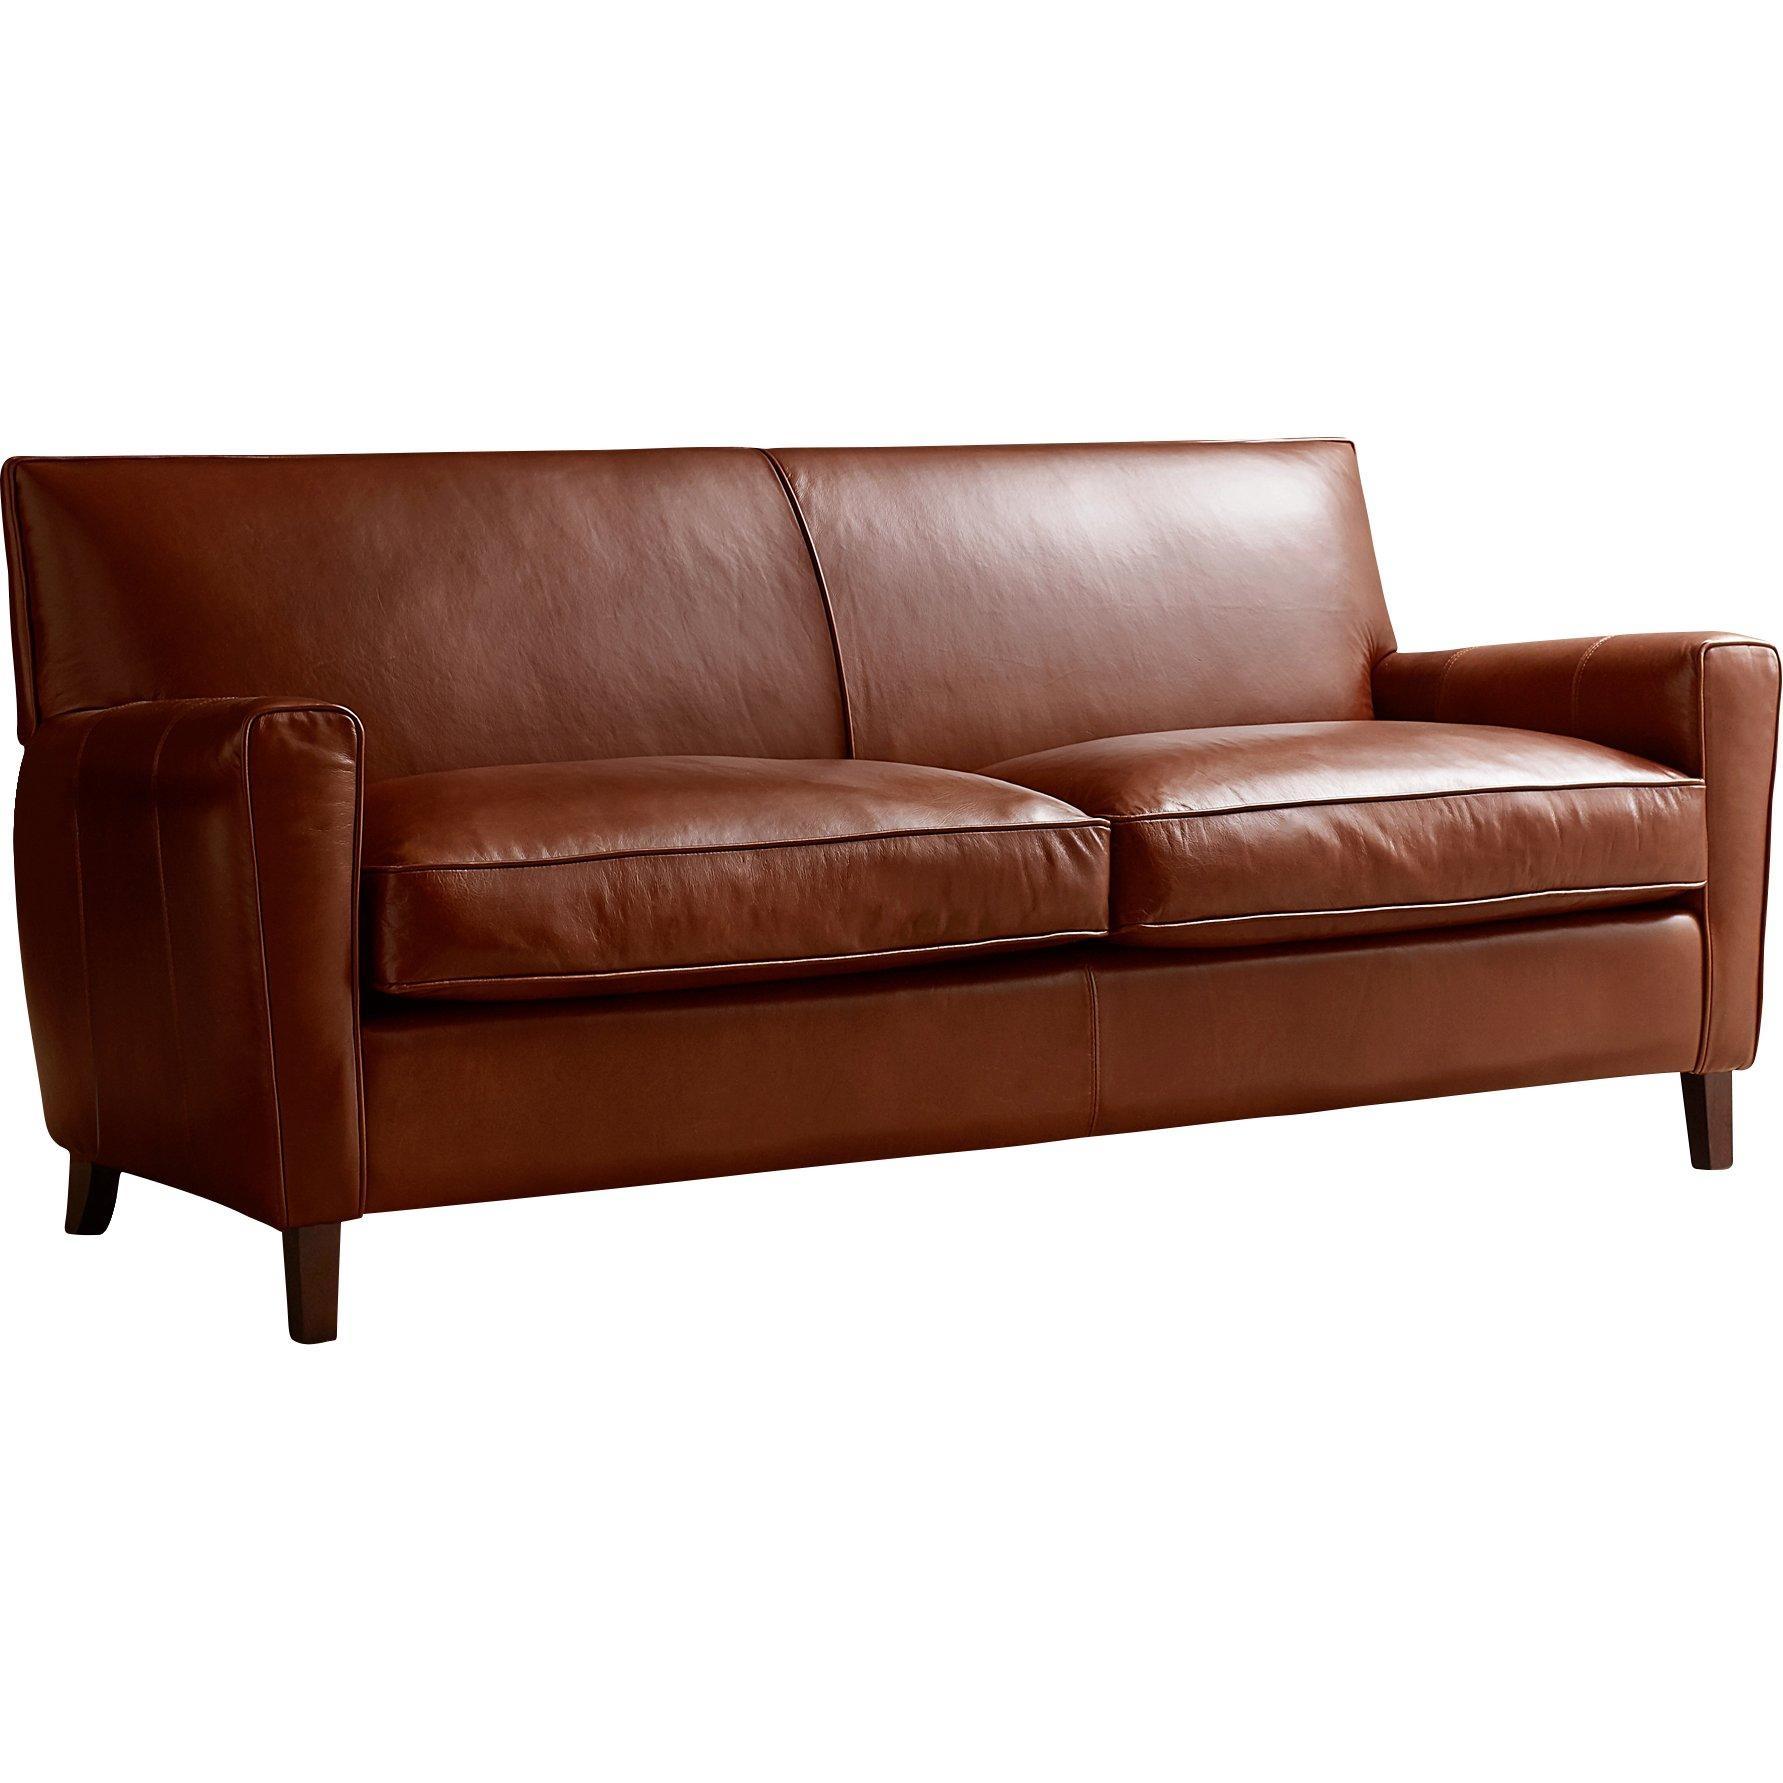 Leather Sofa Contemporary | Tehranmix Decoration Regarding Foster Leather Sofas (View 4 of 20)